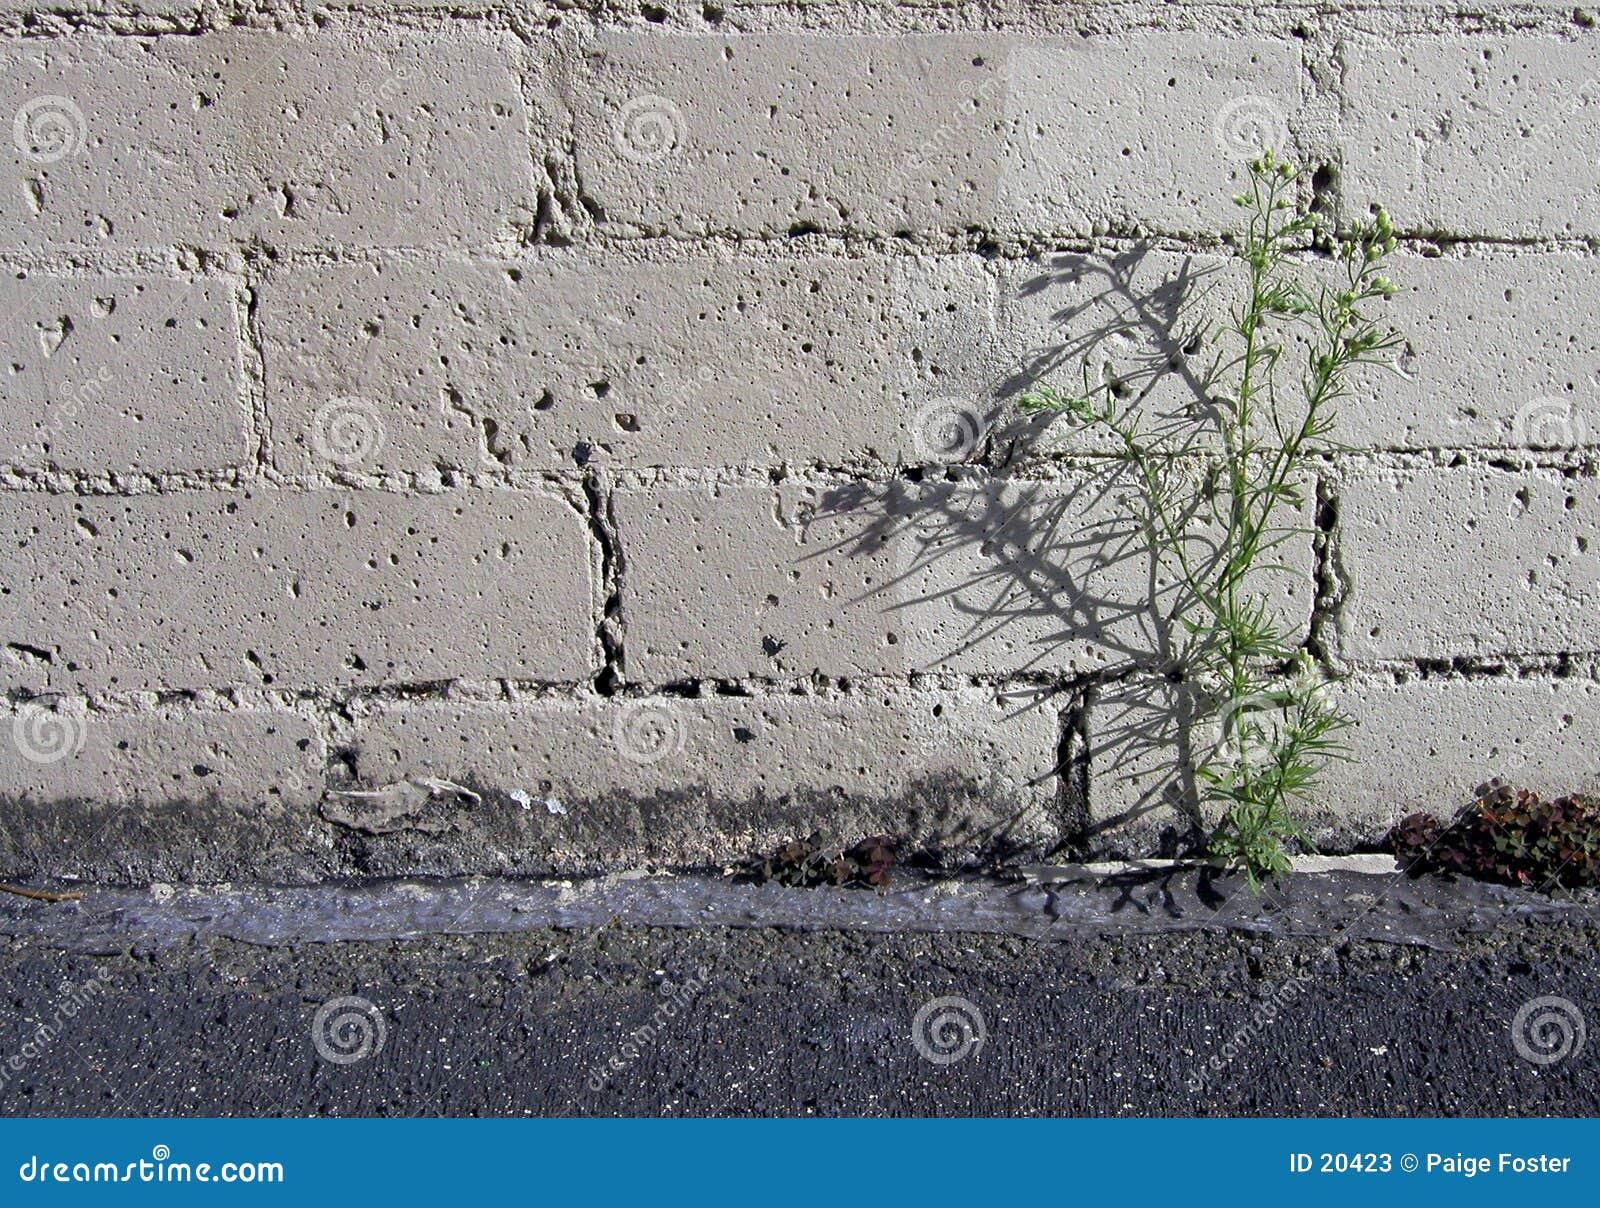 Parking Weed